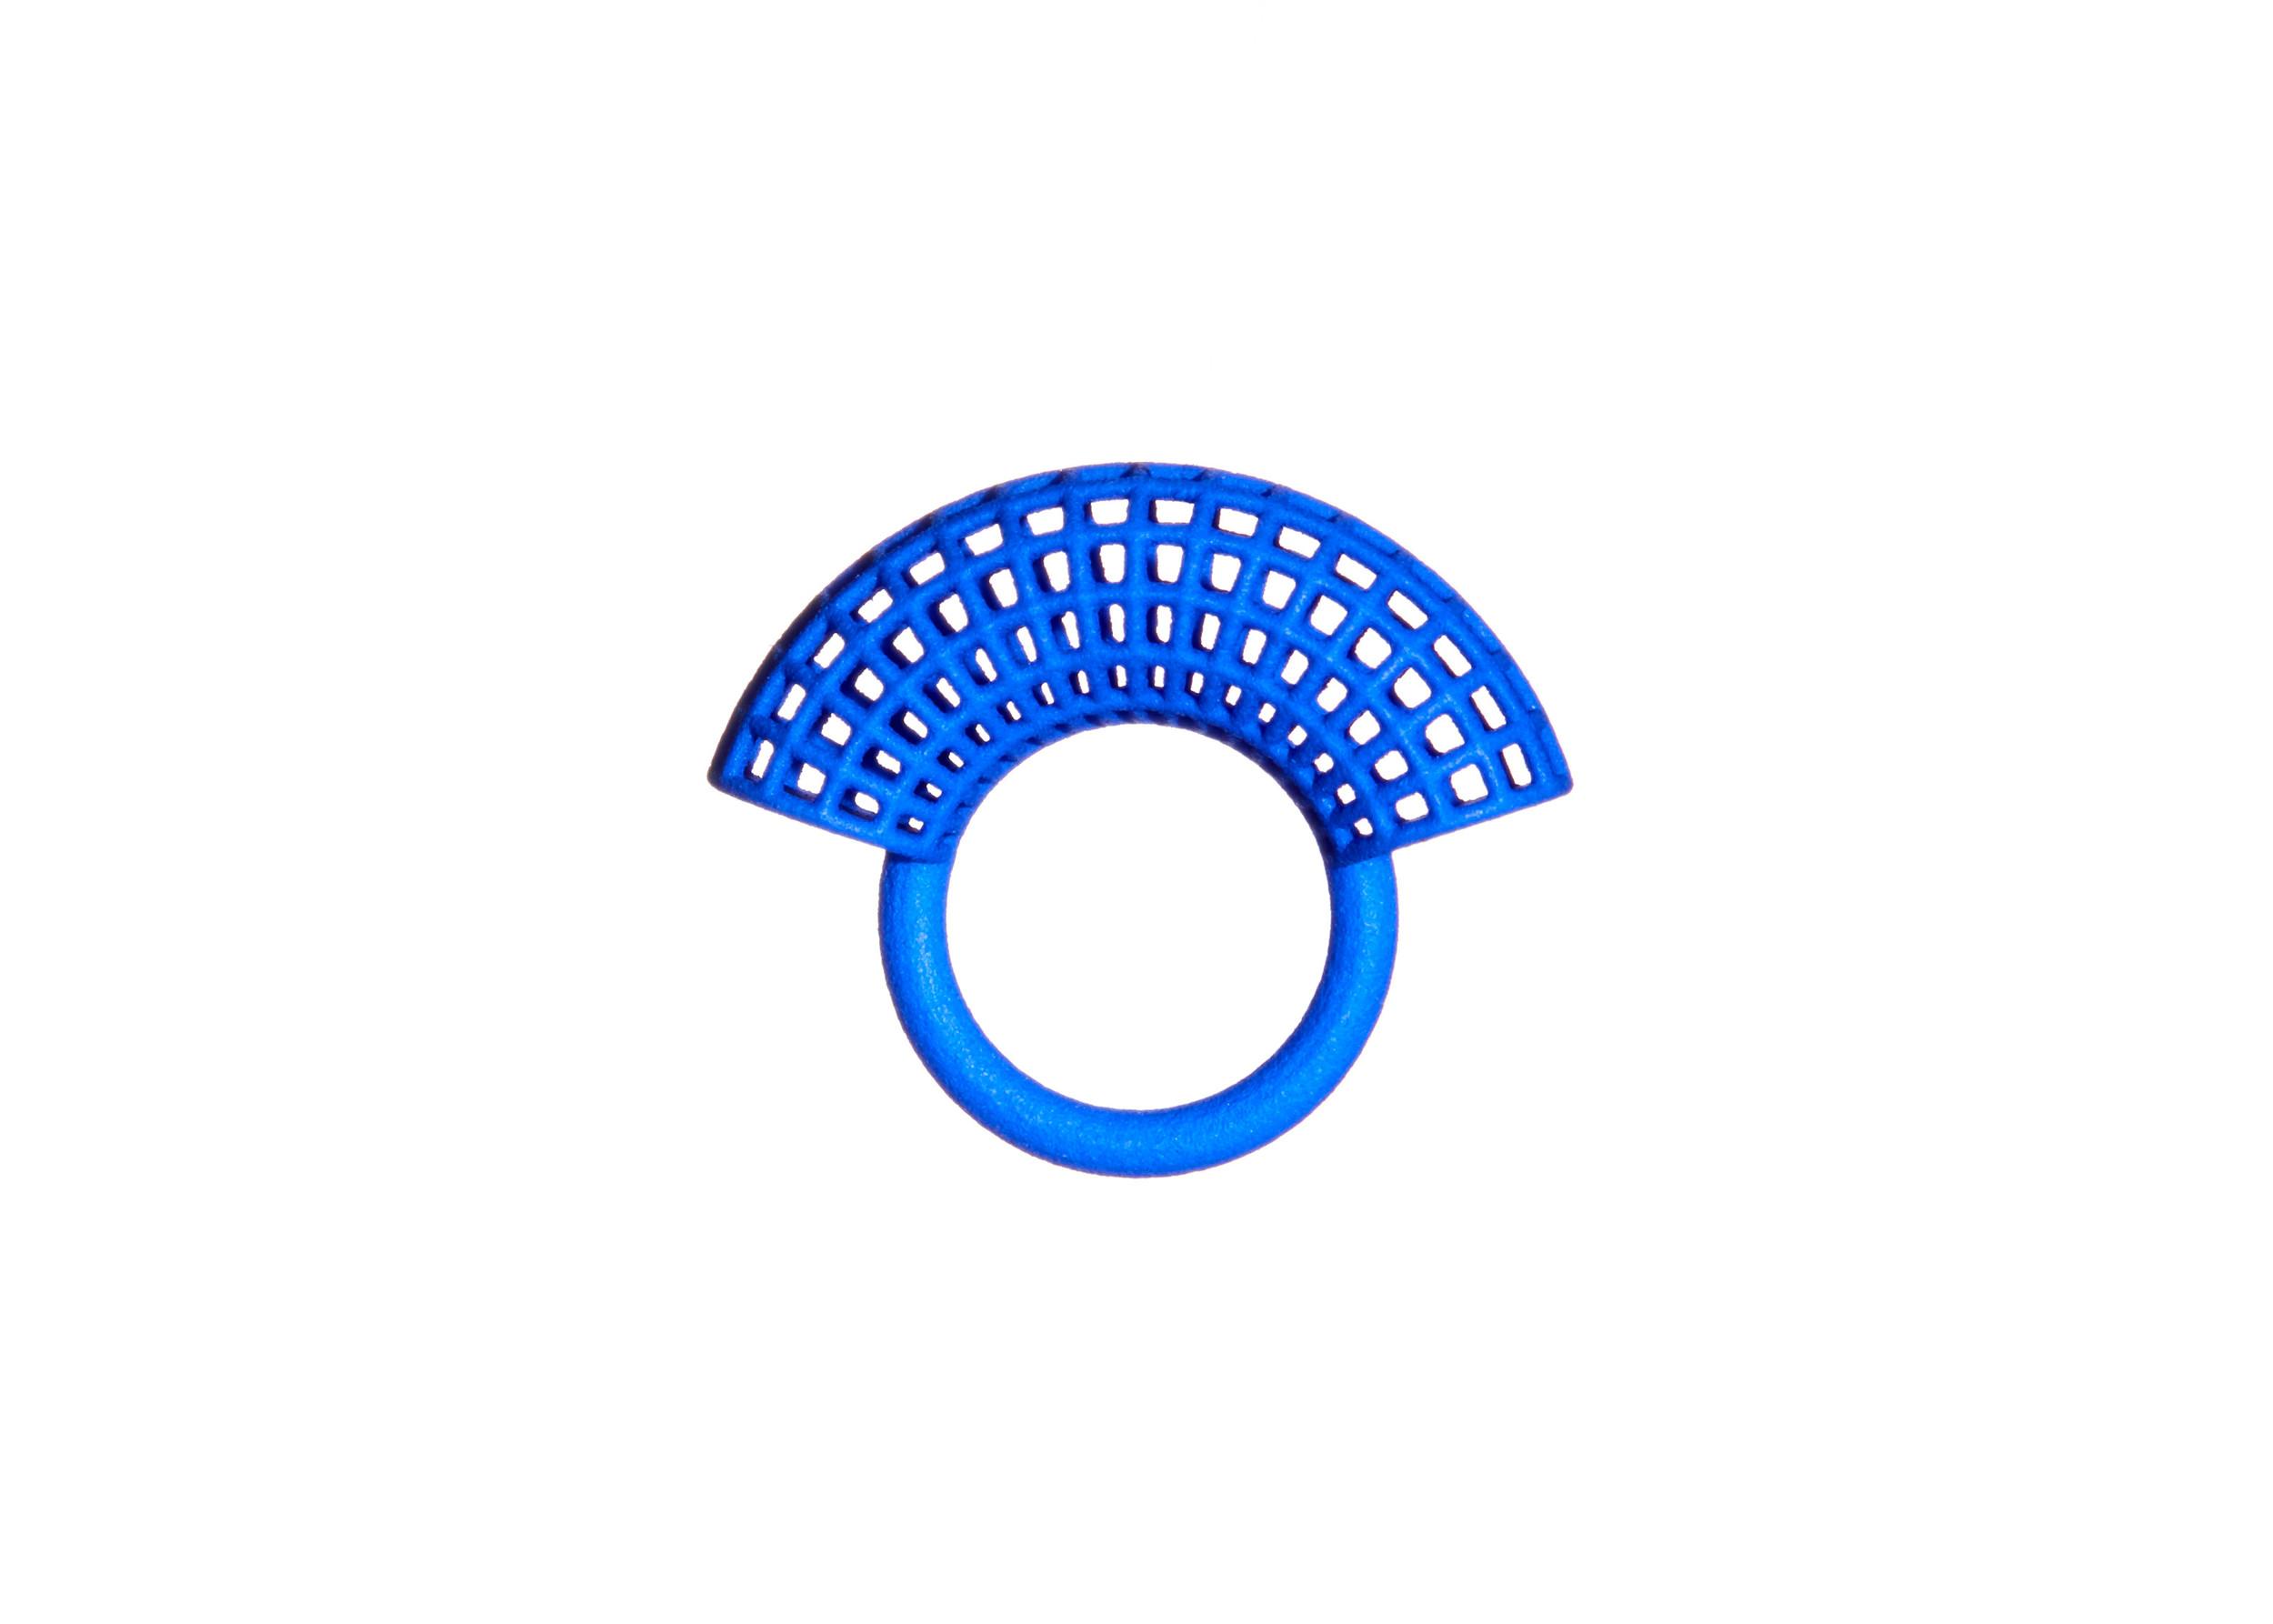 lynne maclachlan Mondrian ring blue.jpg